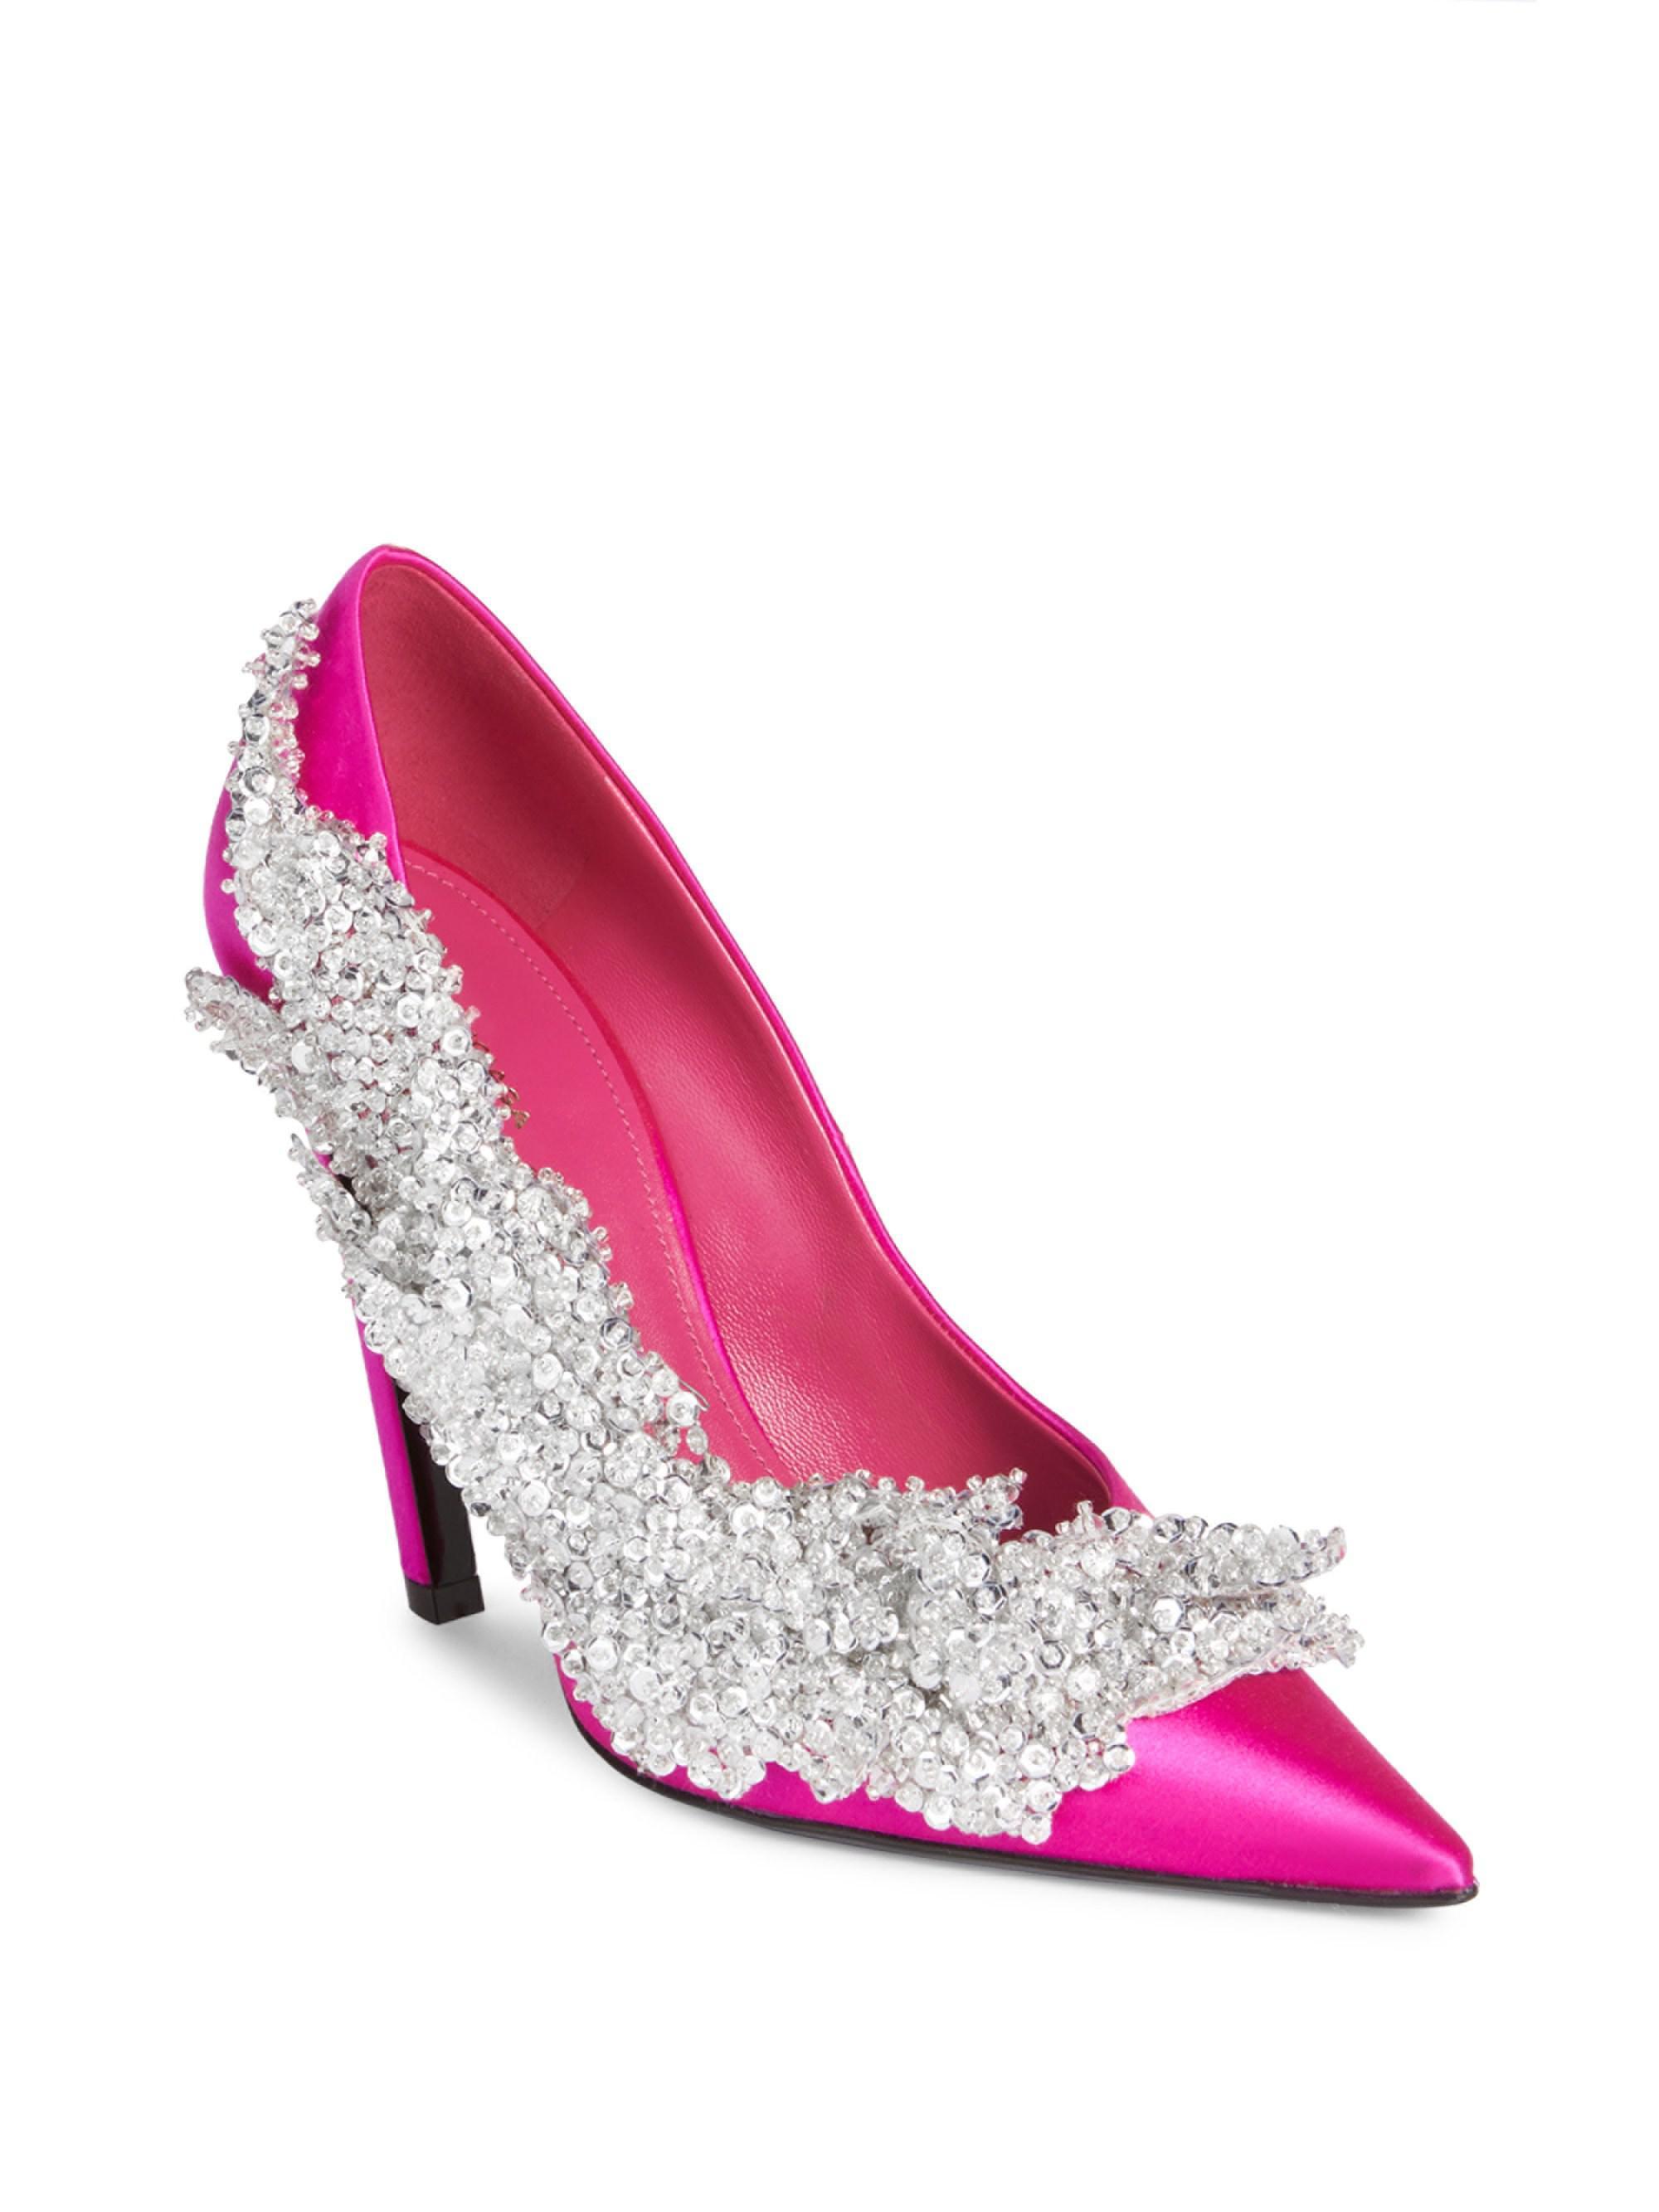 Balenciaga Crystal Satin Pumps in Rose